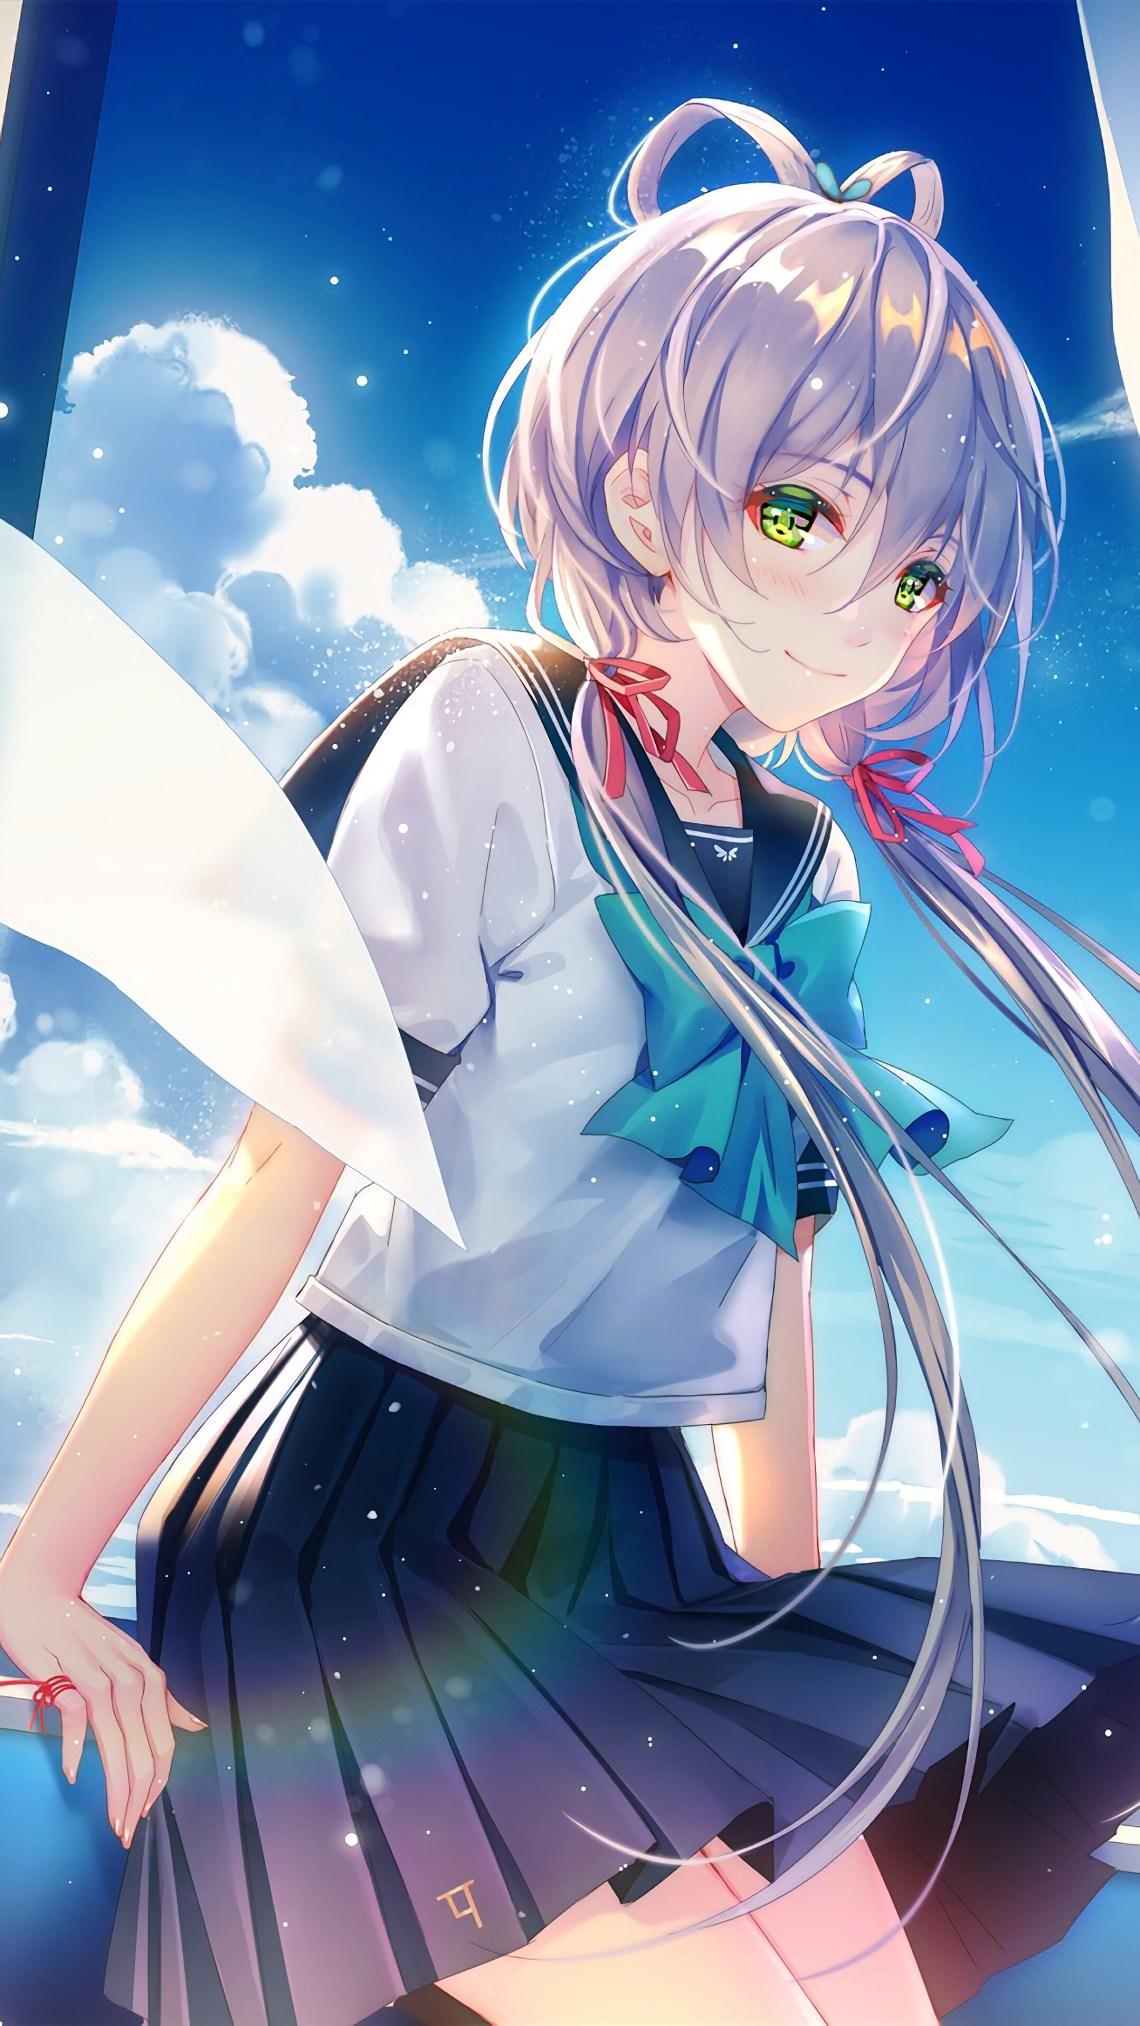 19 Beautiful Anime Wallpaper For Mobile Anime Wallpaper